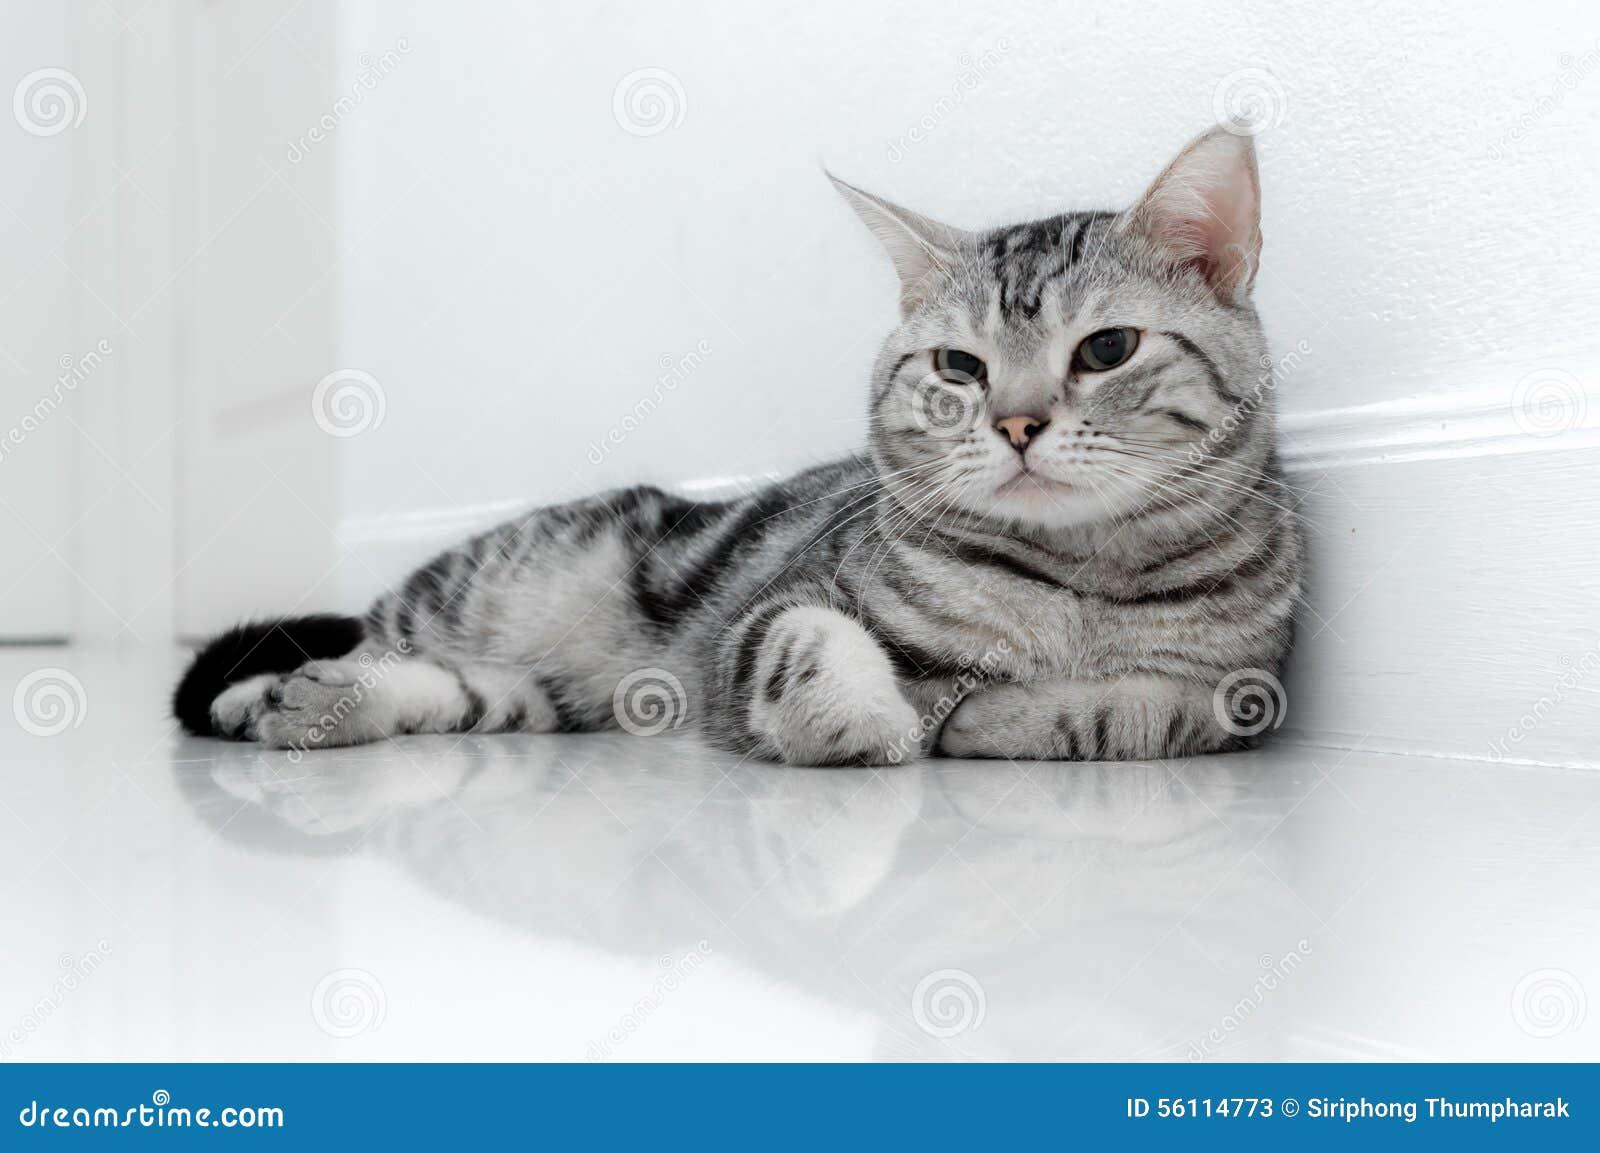 american shorthair cat stock image image of looking 56114773